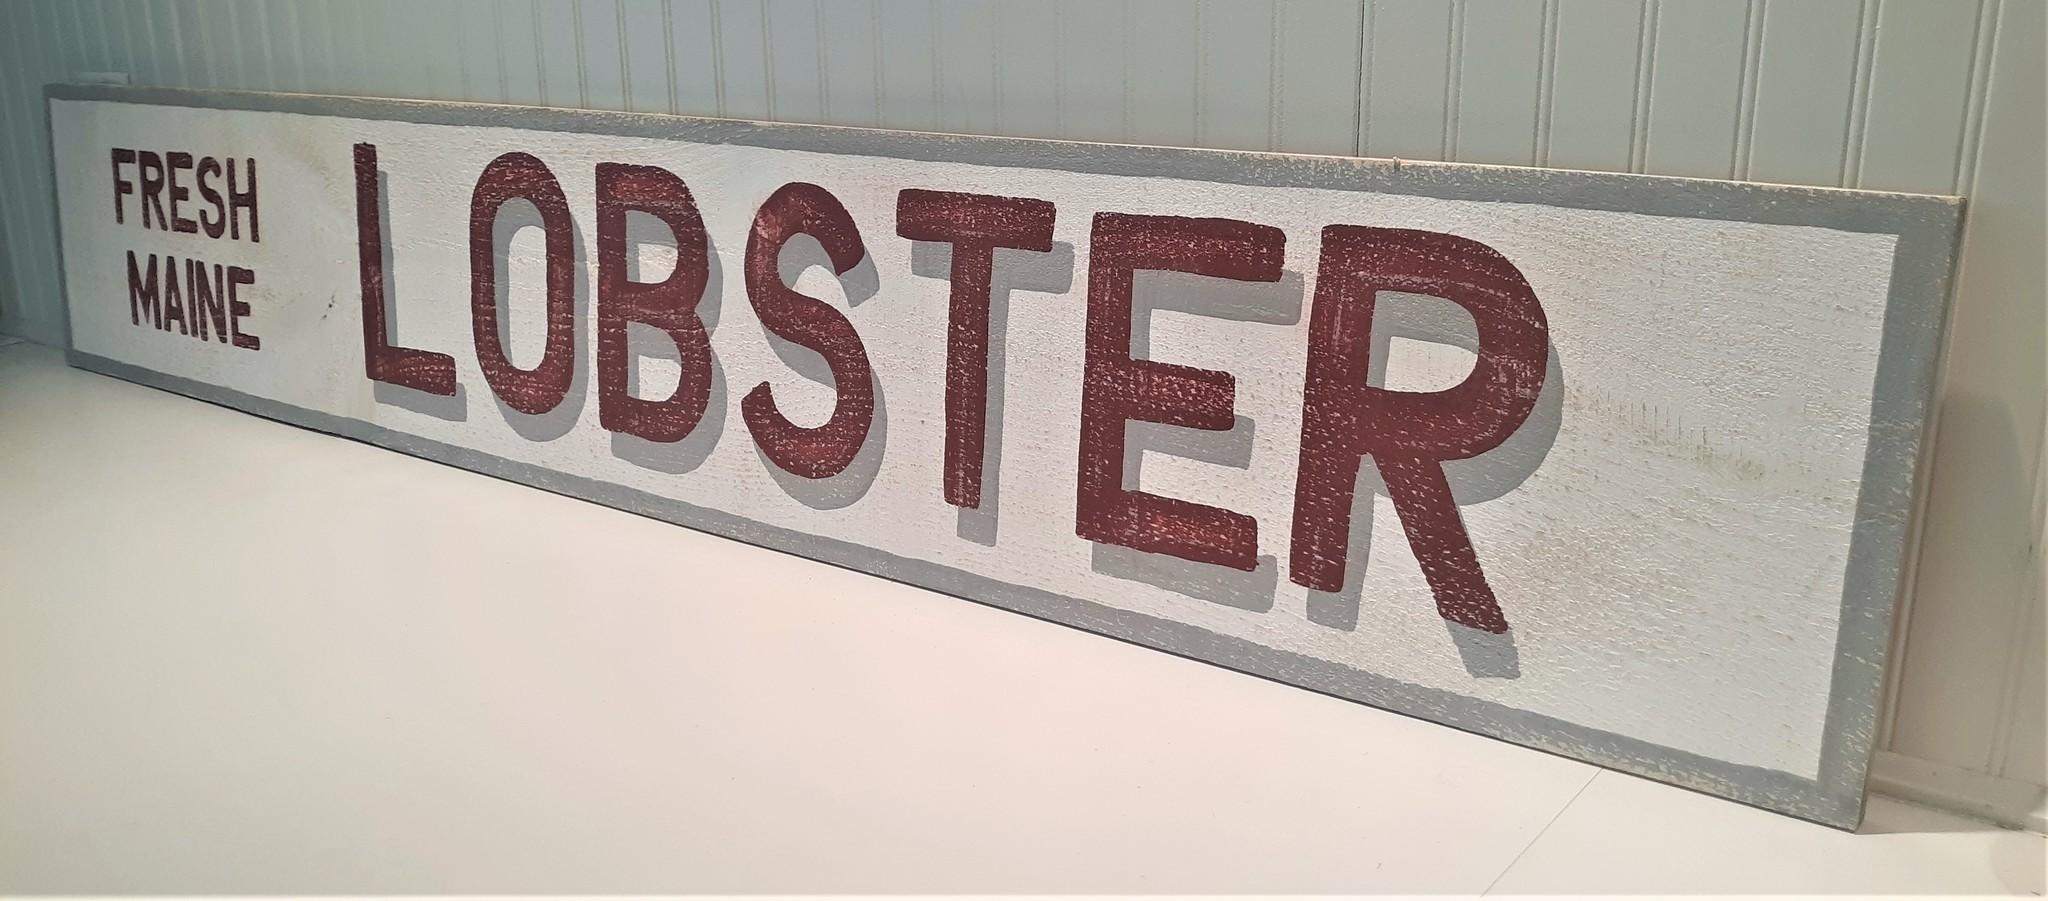 Marina Salute Fresh Maine Lobster